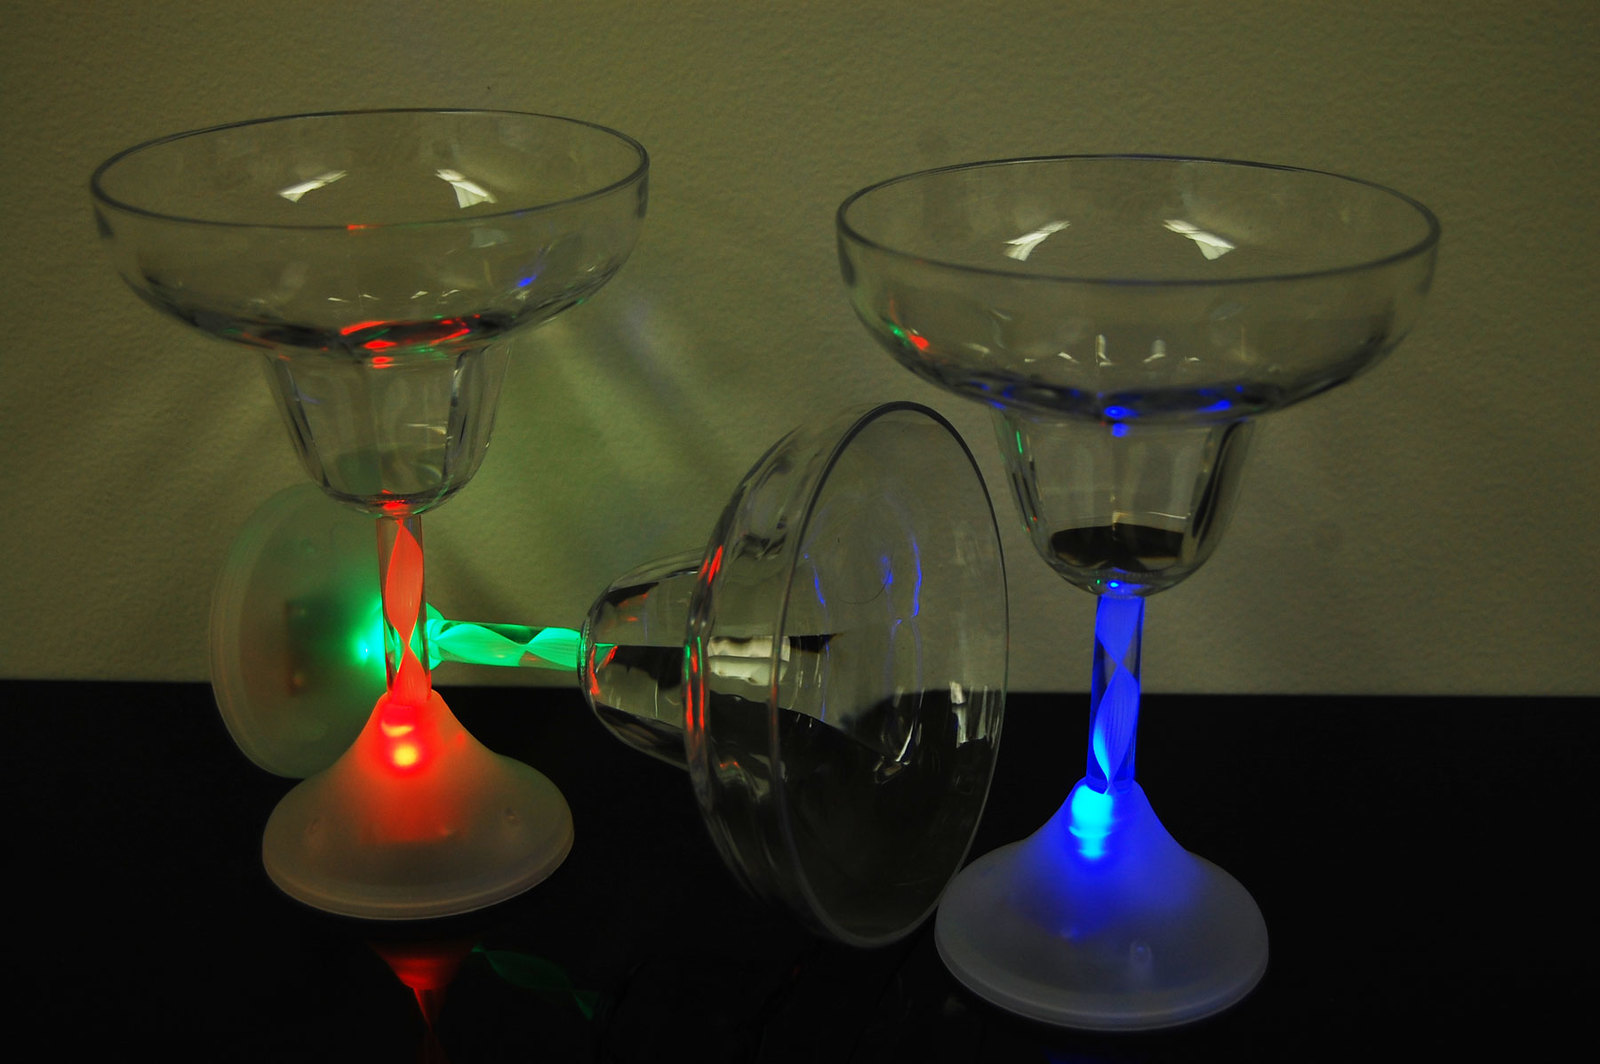 2 Pack 8 Mode Color Changing LED Margarita Glasses - $9.95